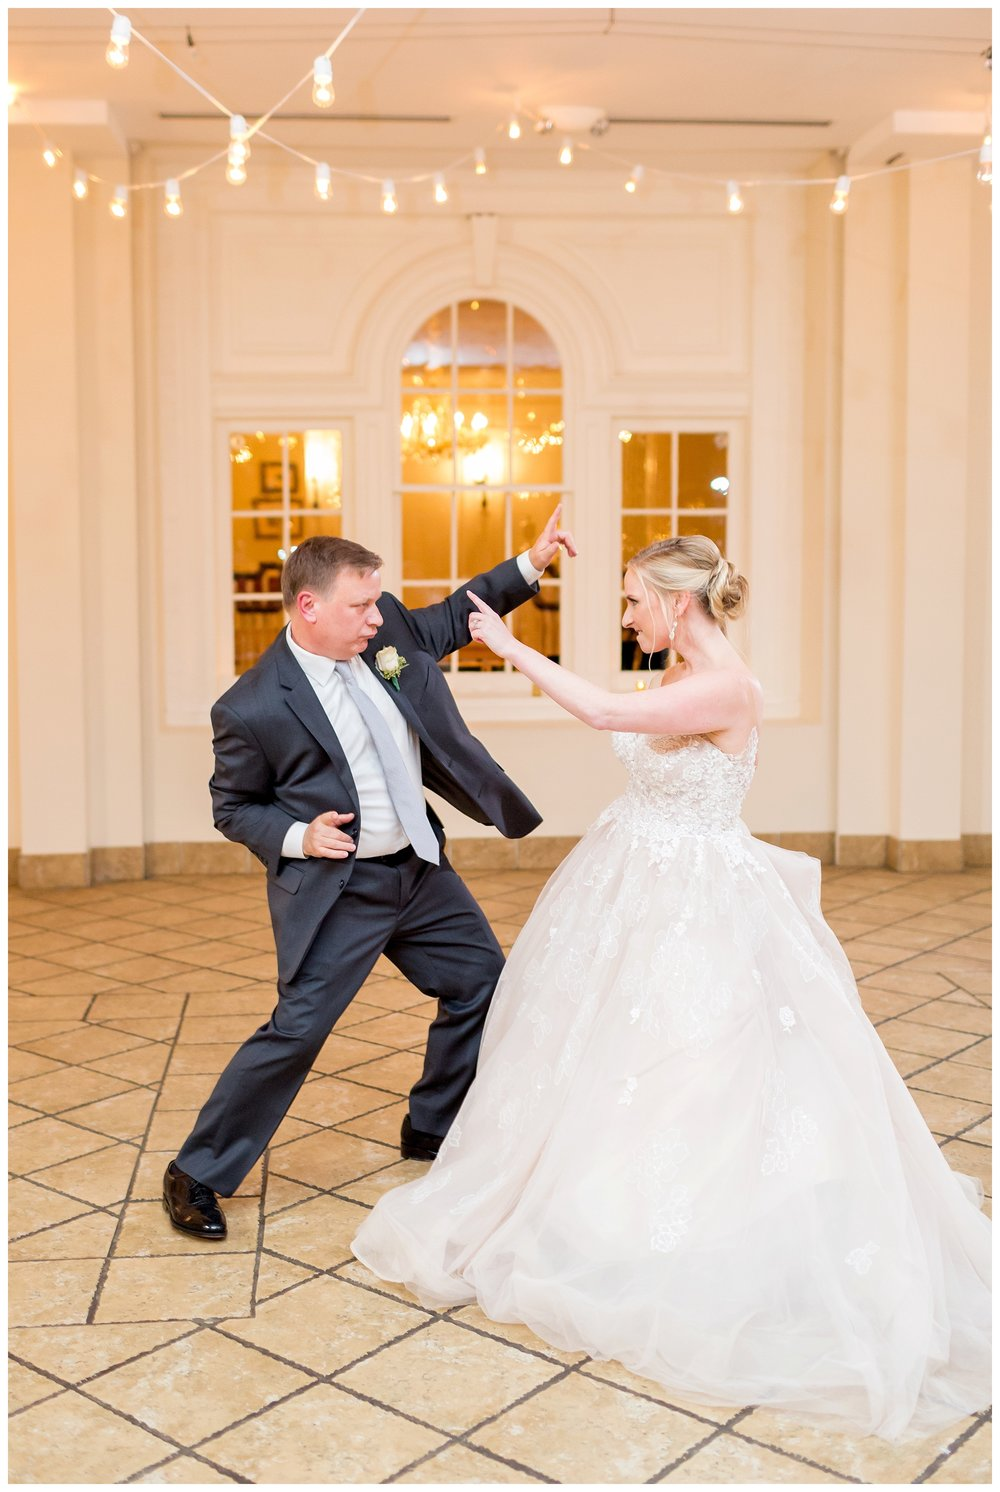 Whitehall Estate Wedding | Northern Virginia Wedding Photographer Kir Tuben_0108.jpg